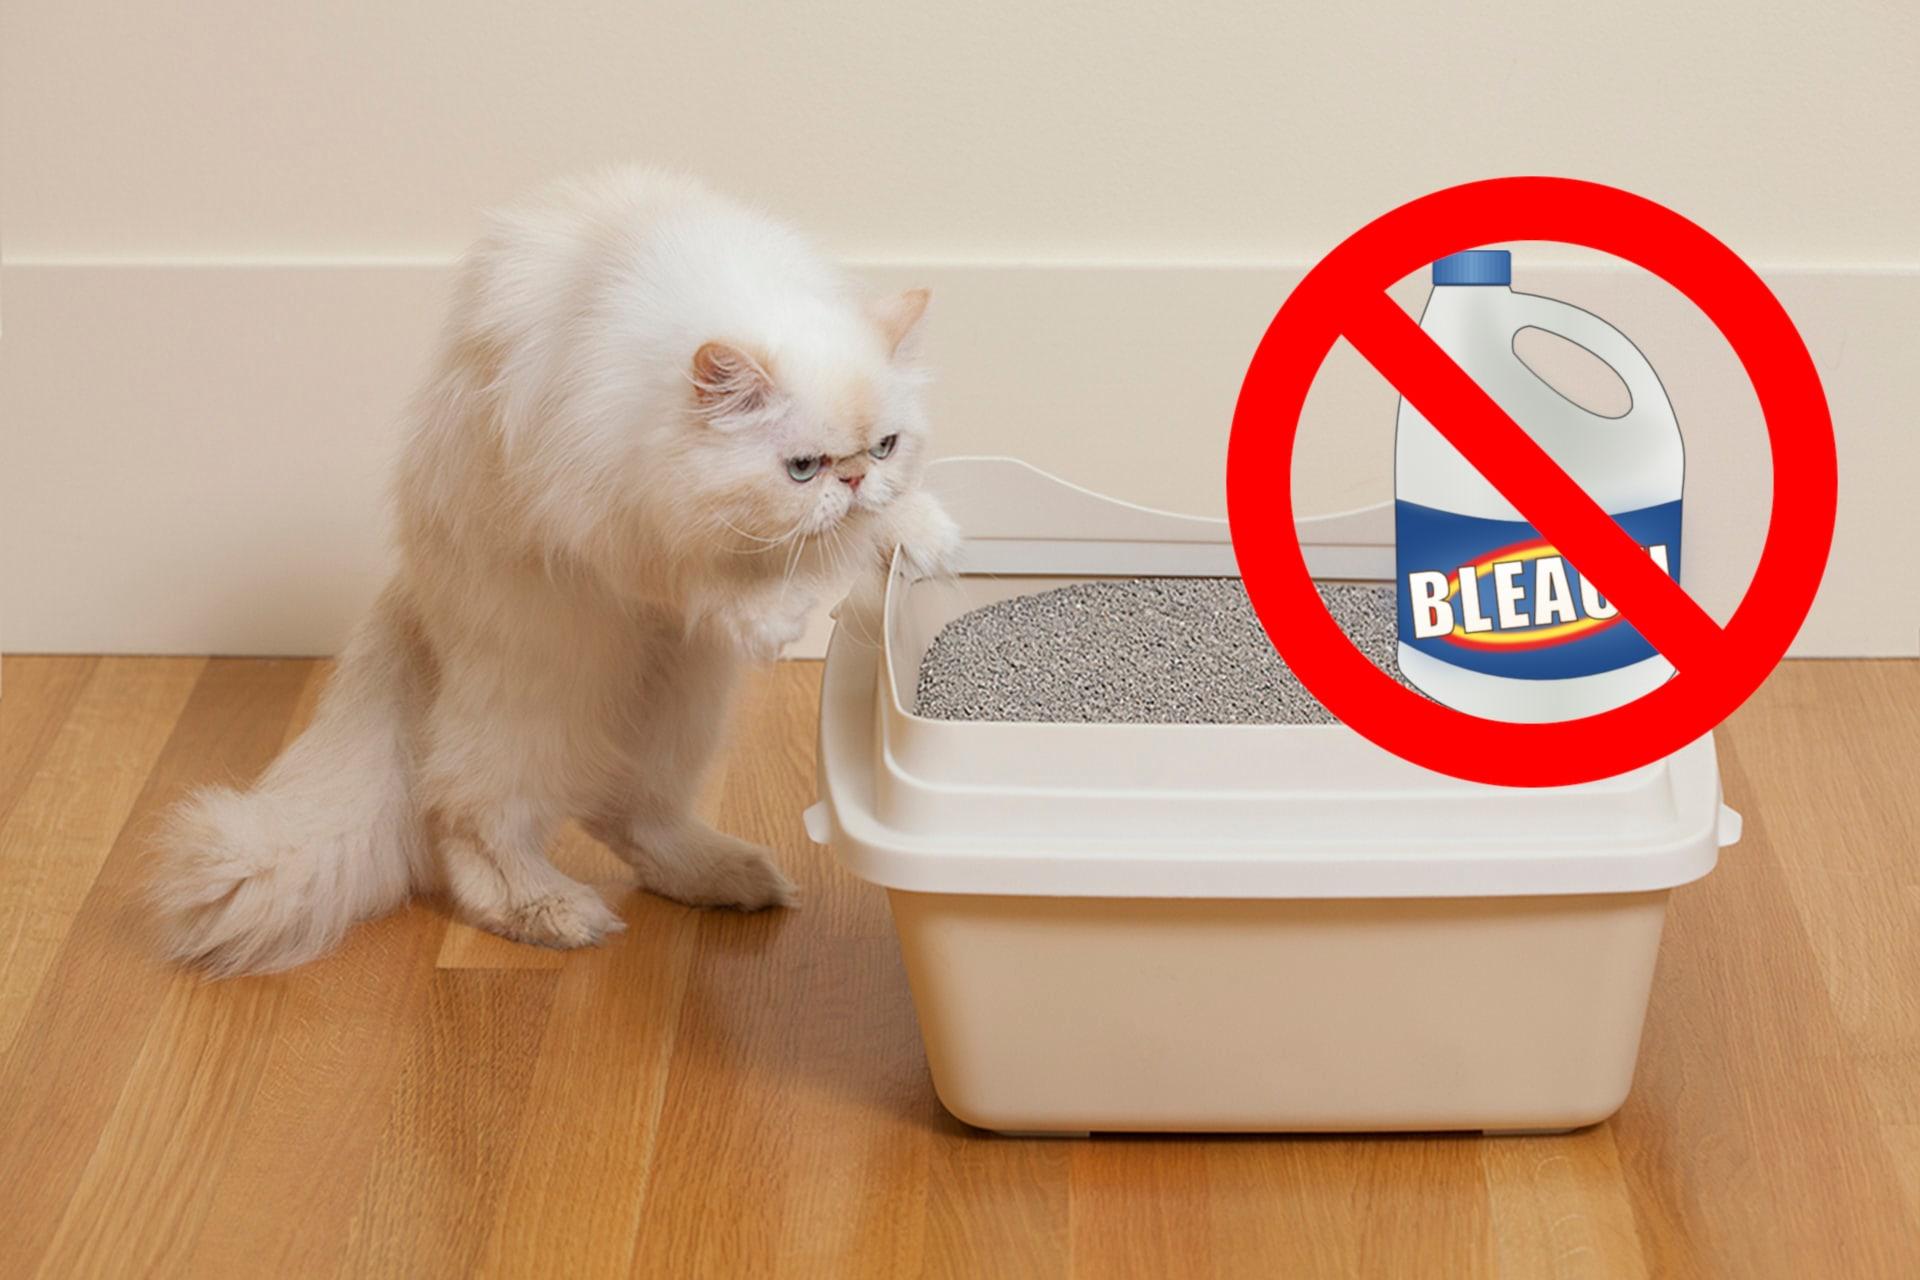 Cat Bleach Harmful